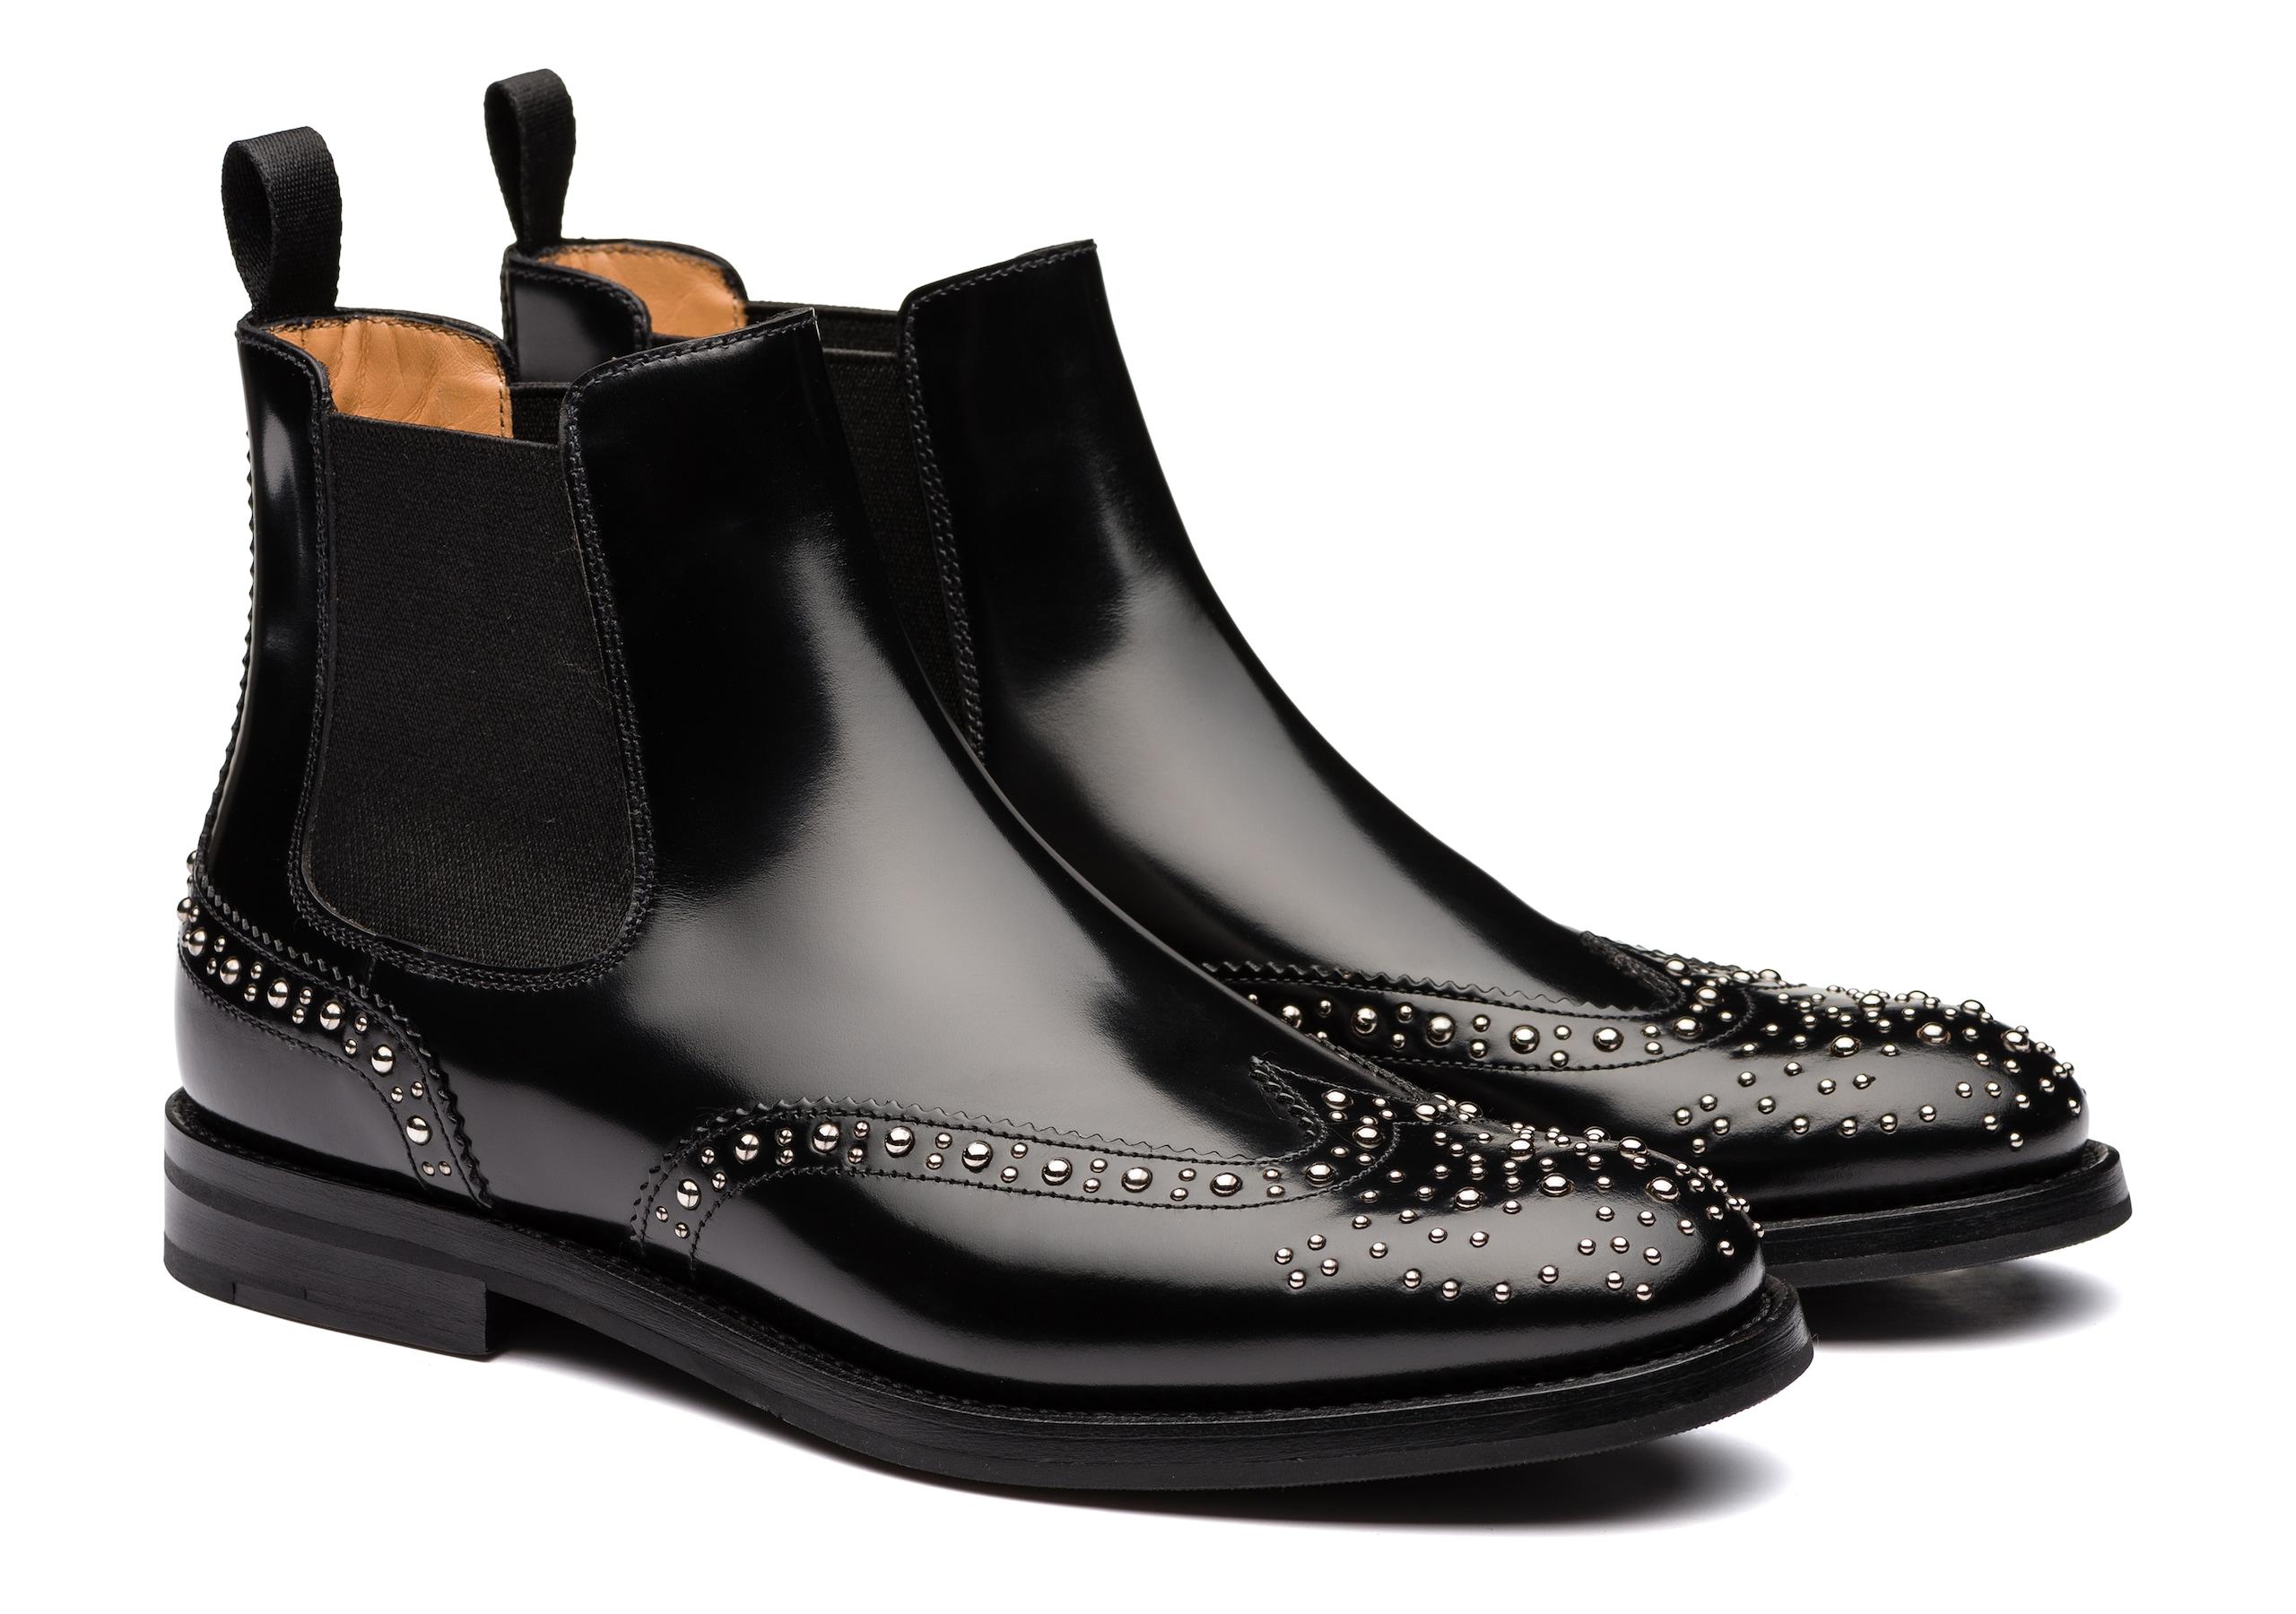 Ketsby met Church's Polished Binder Chelsea Boot Stud Black